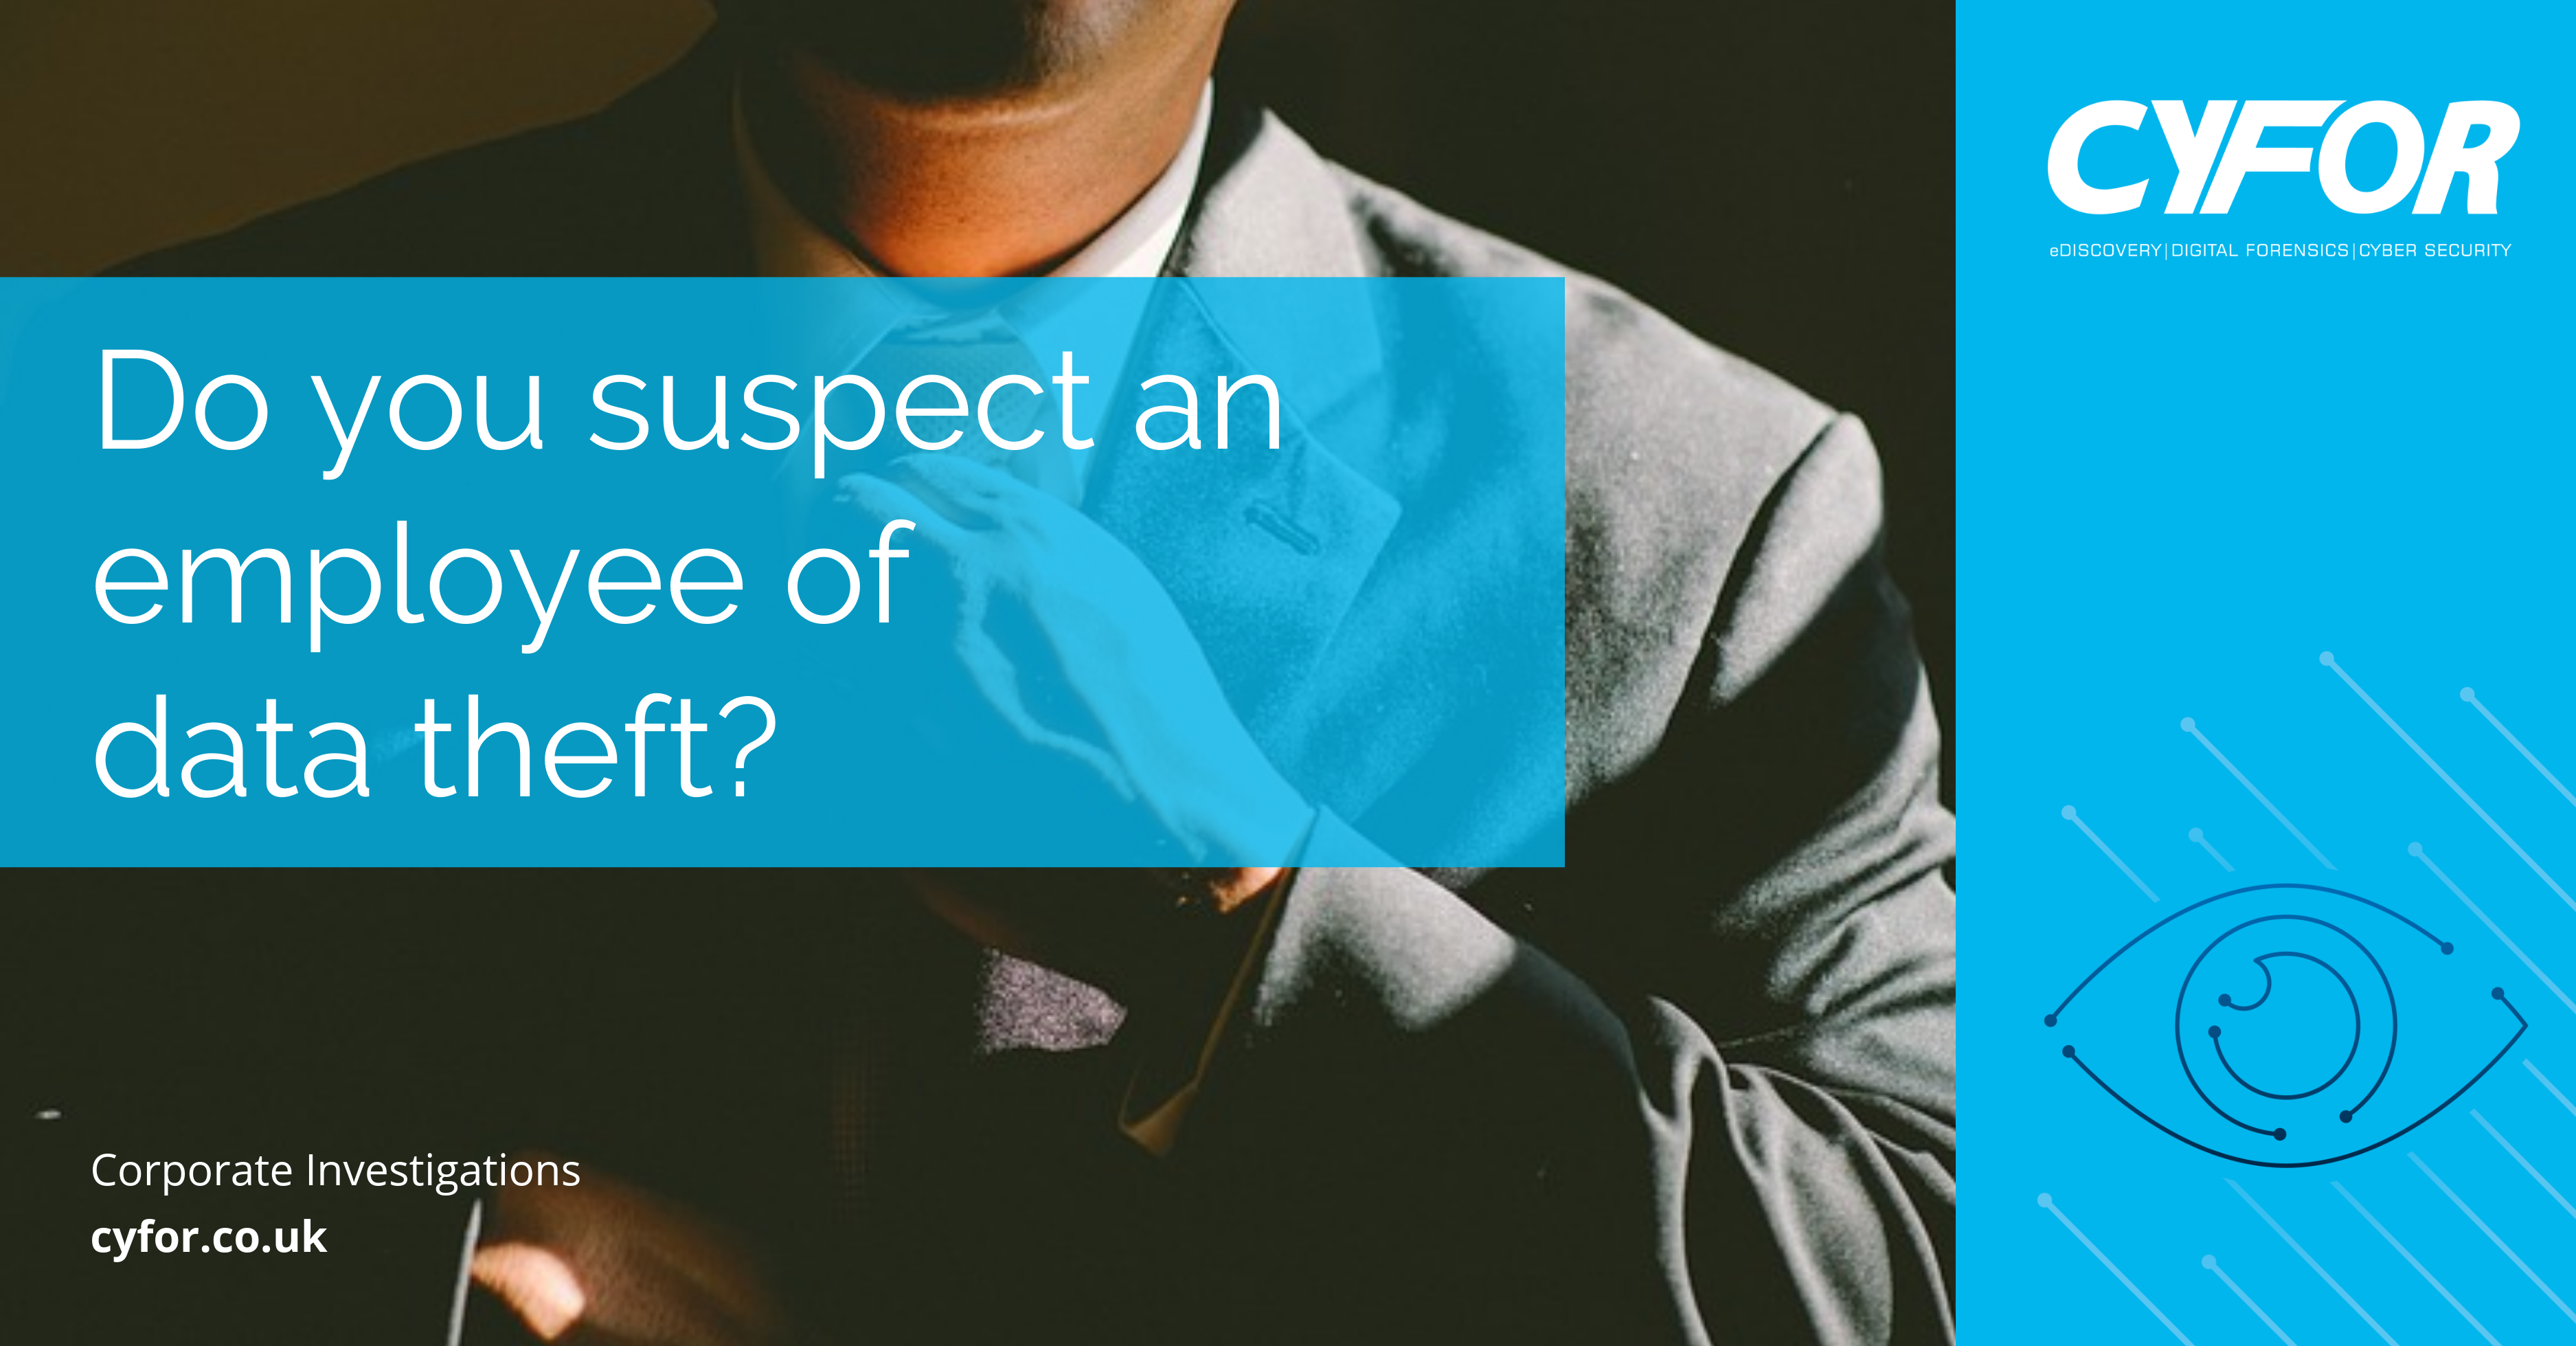 suspect an employee of data theft